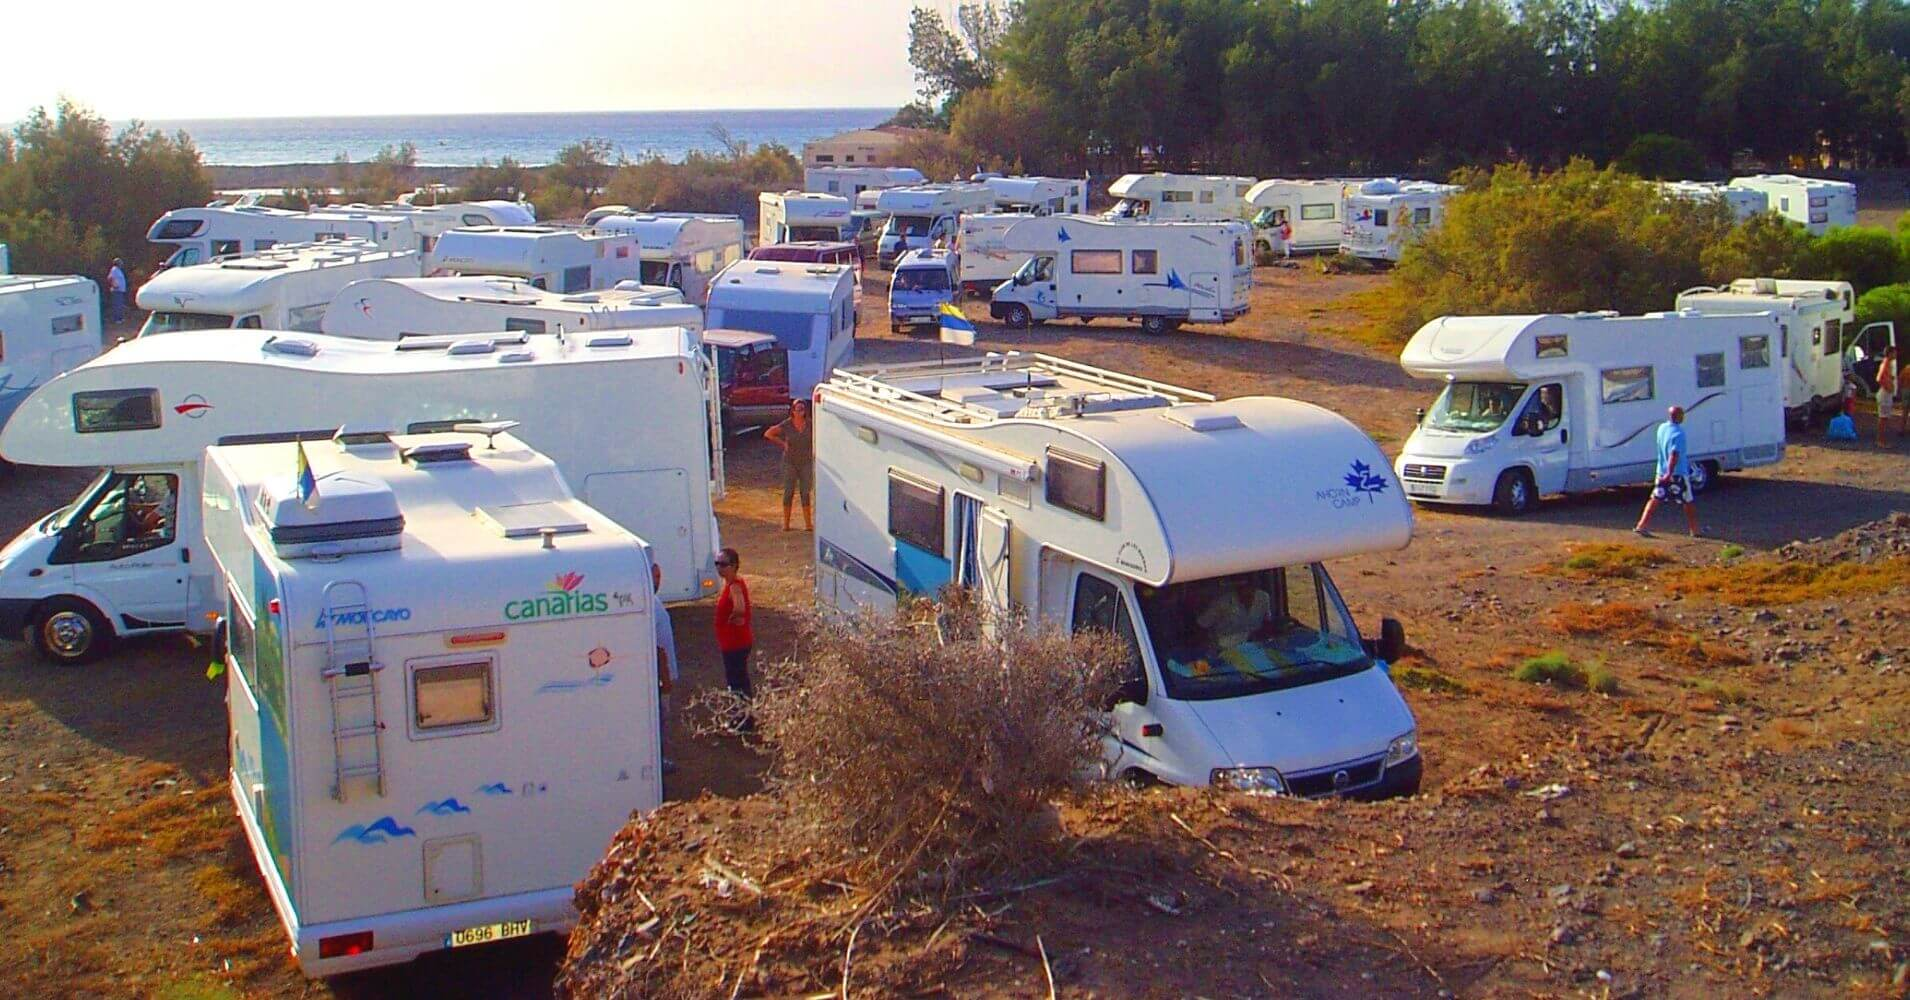 Clubes de Camping de España. Unión de Caravanistas de Canarias.